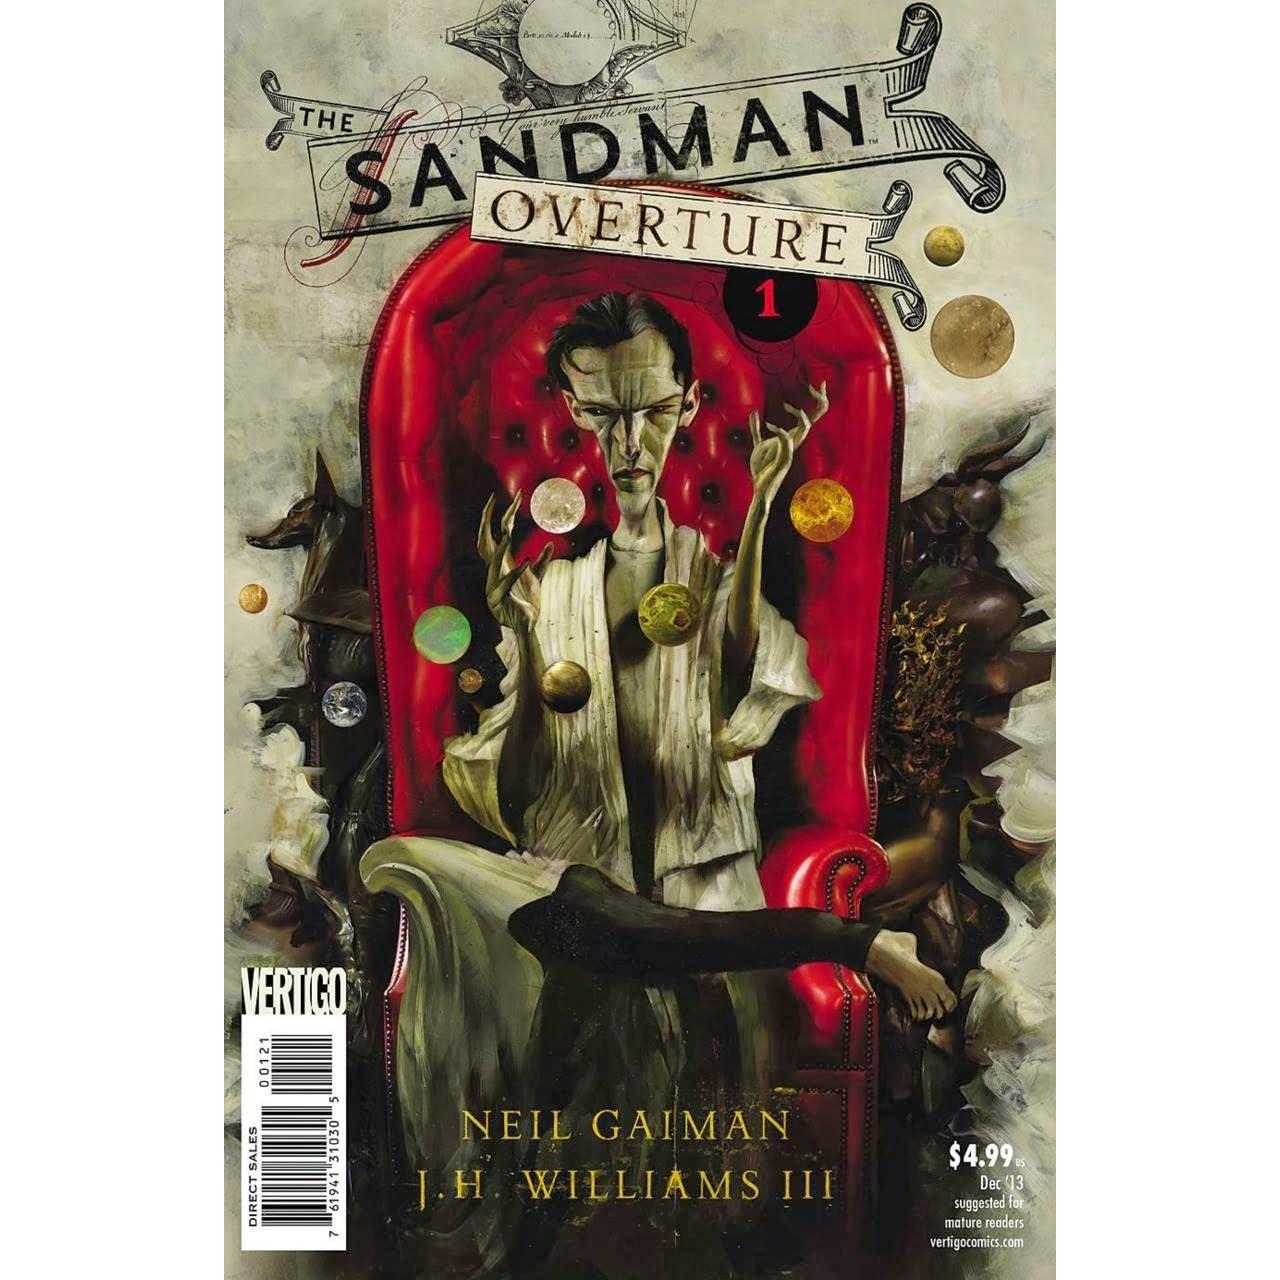 SANDMAN #5 VOL 1 DC VERTIGO COMIC NEIL GAIMAN MAY 1989